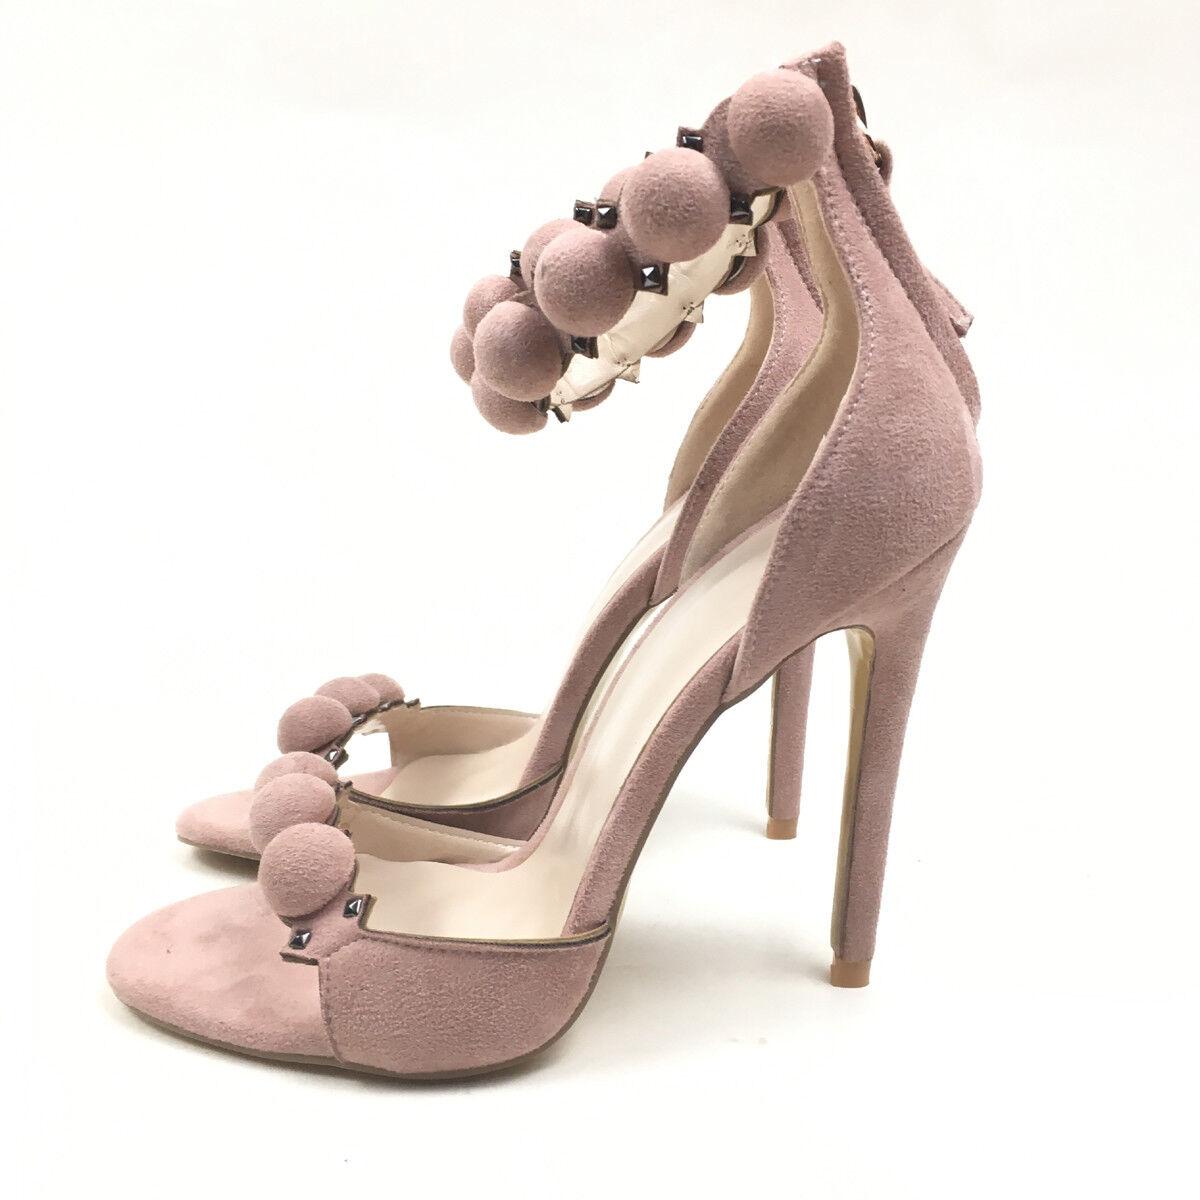 mujer Peep Toe High Heel Sandals Ankle Sphere & & & Gunmetal Pyramid Stud zapatos  online al mejor precio